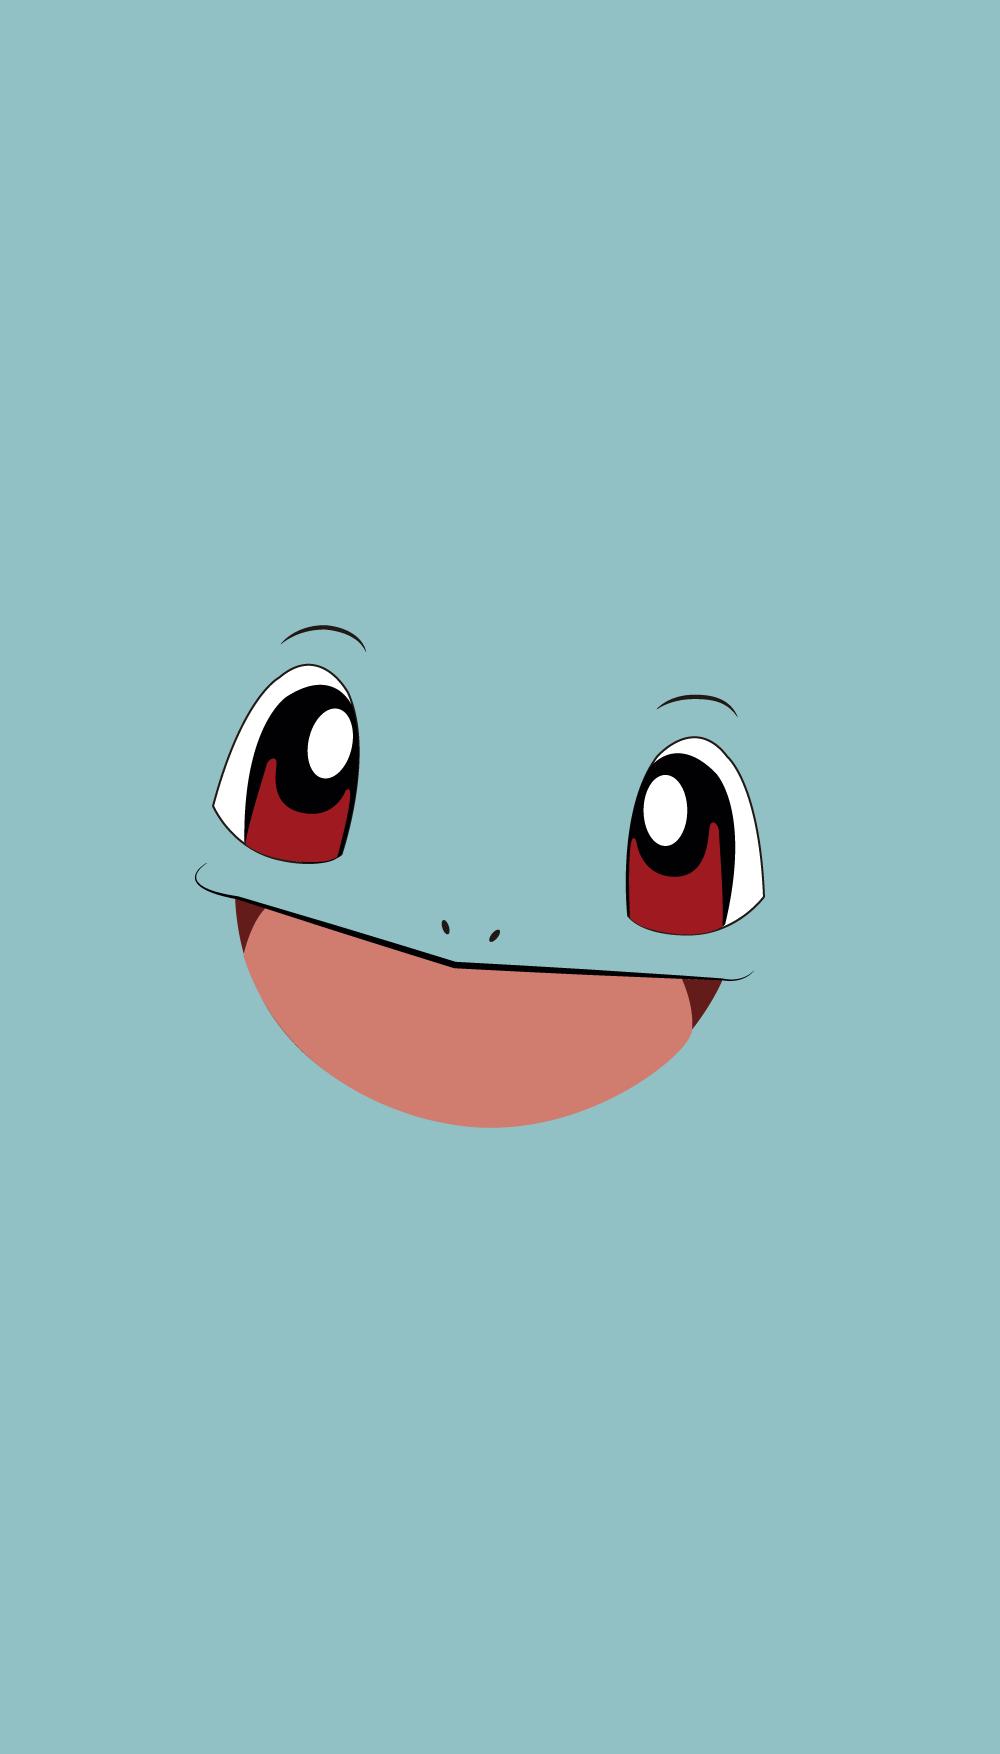 pokemon walpaper squirtle | ポケモン ミニマリスト | pinterest